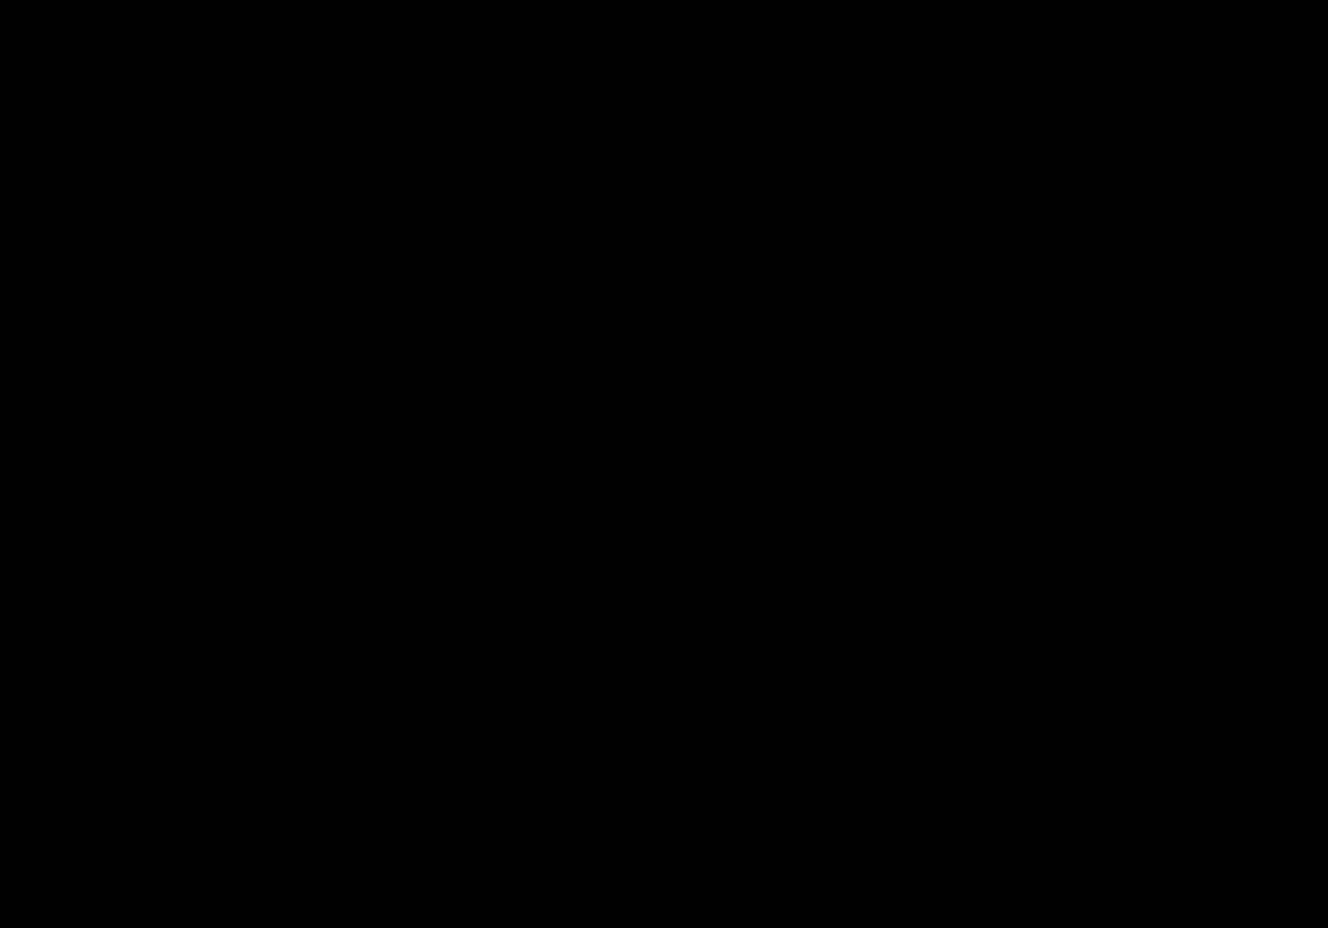 3-Fluoro-4-isopropylaminobenzeneboronic acid pinacol ester